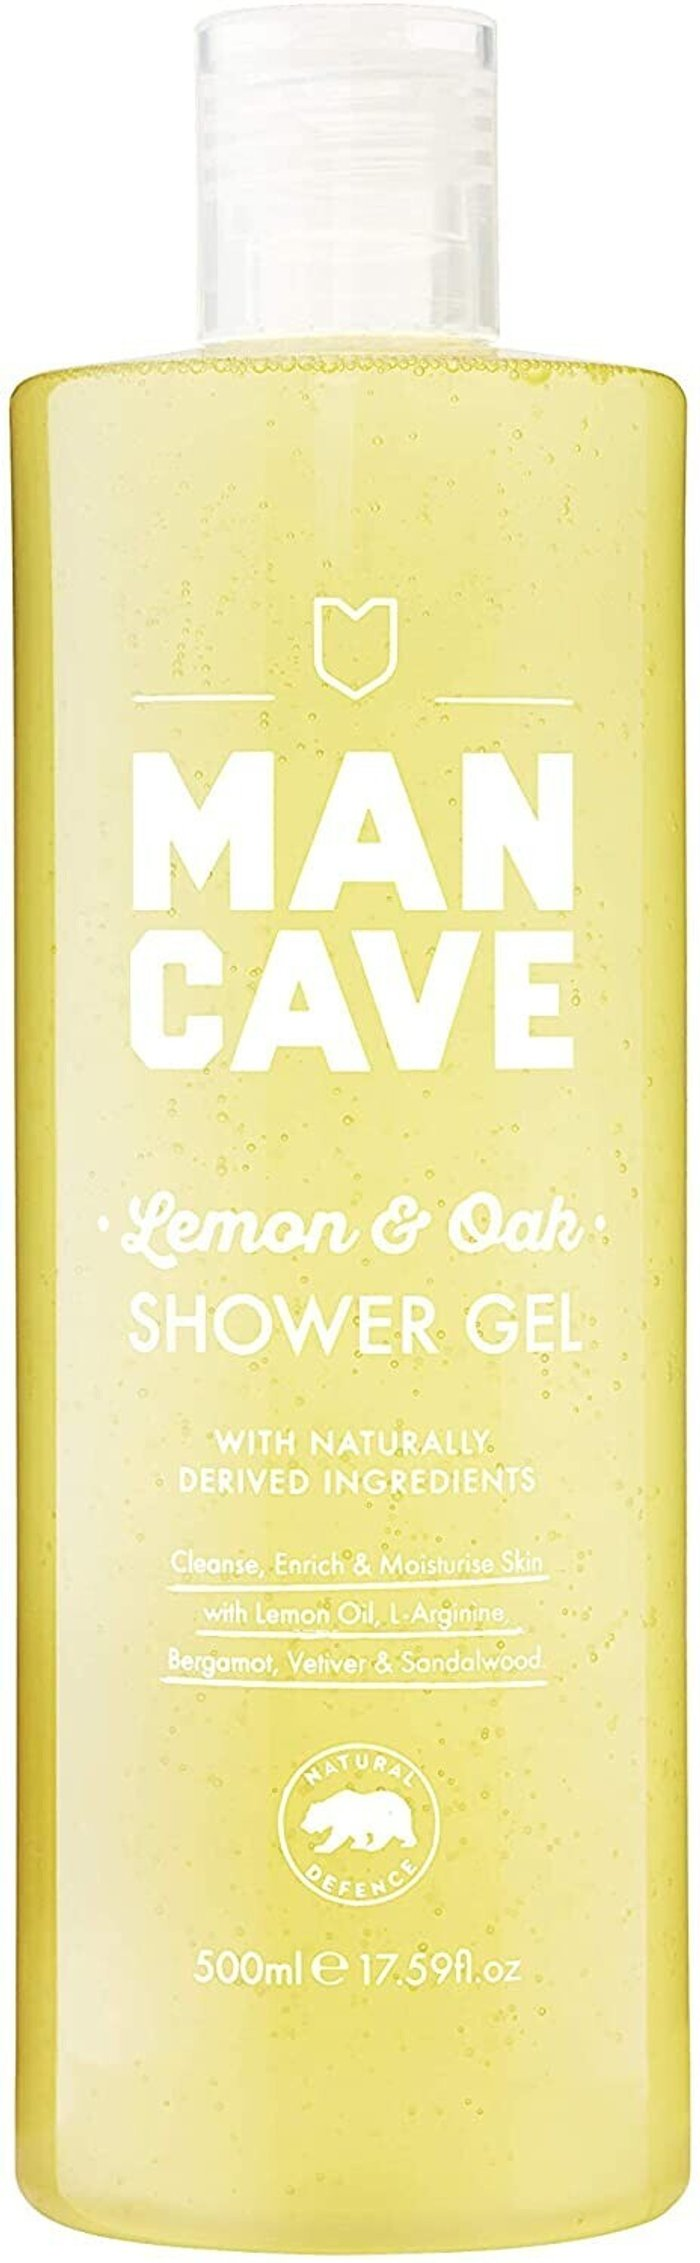 ManCave ManCave Man Cave Lemon Oak Shower Gel